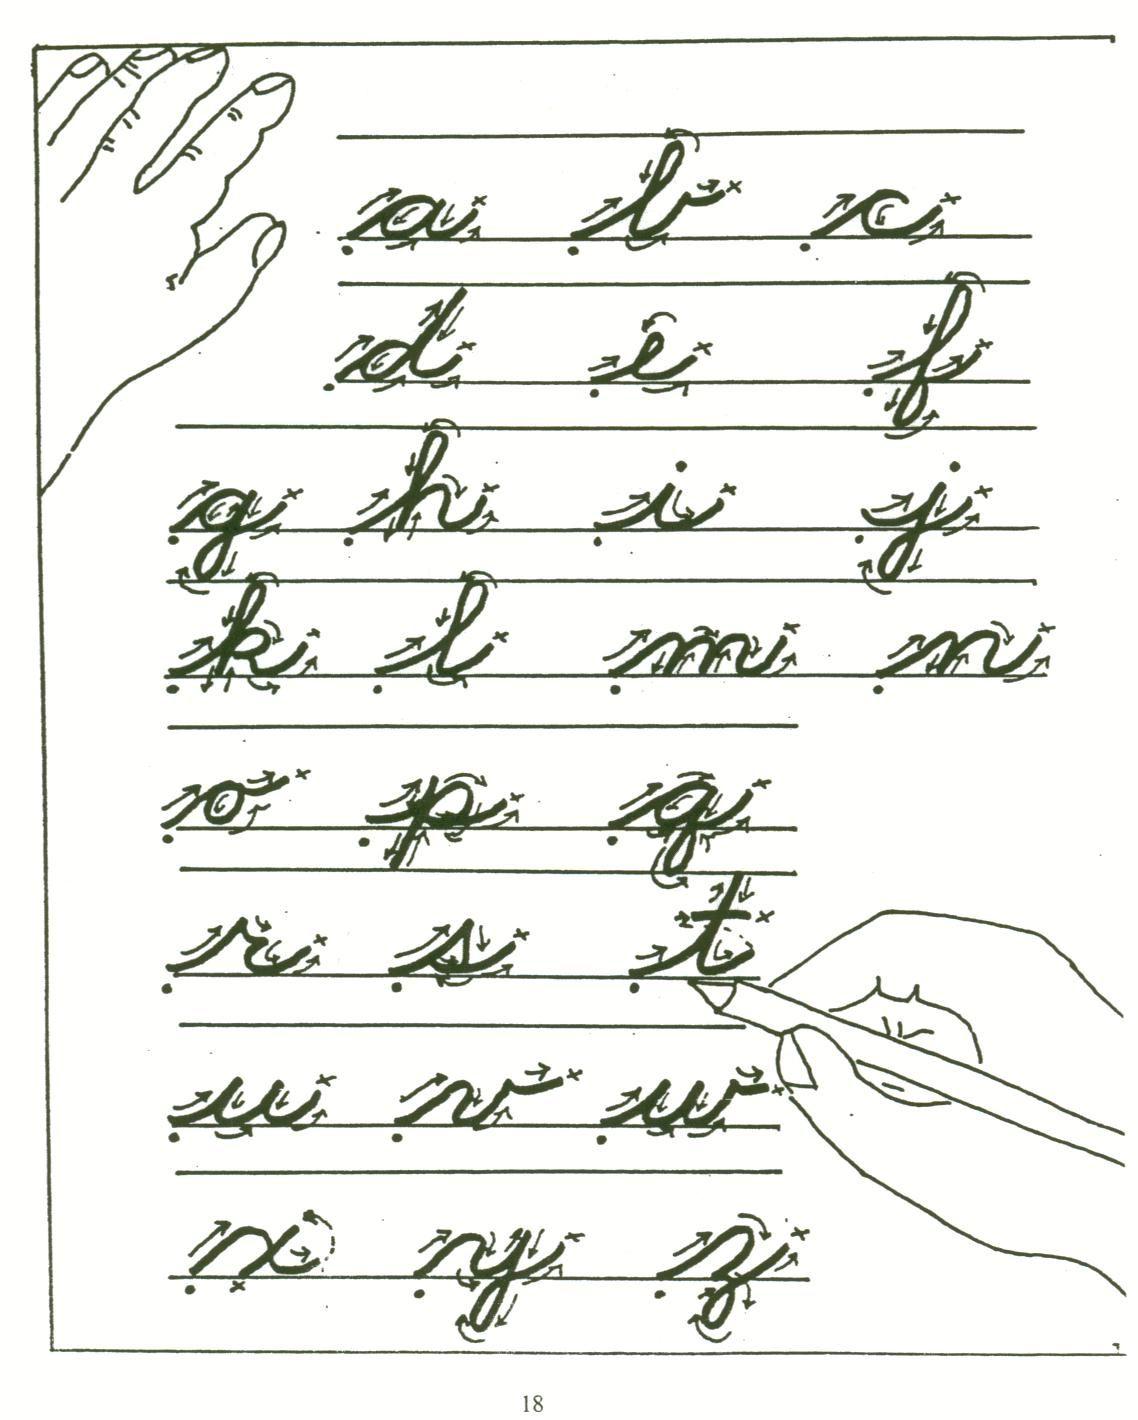 Practice cursive writing handwriting chart funny patrick pics also rh pinterest